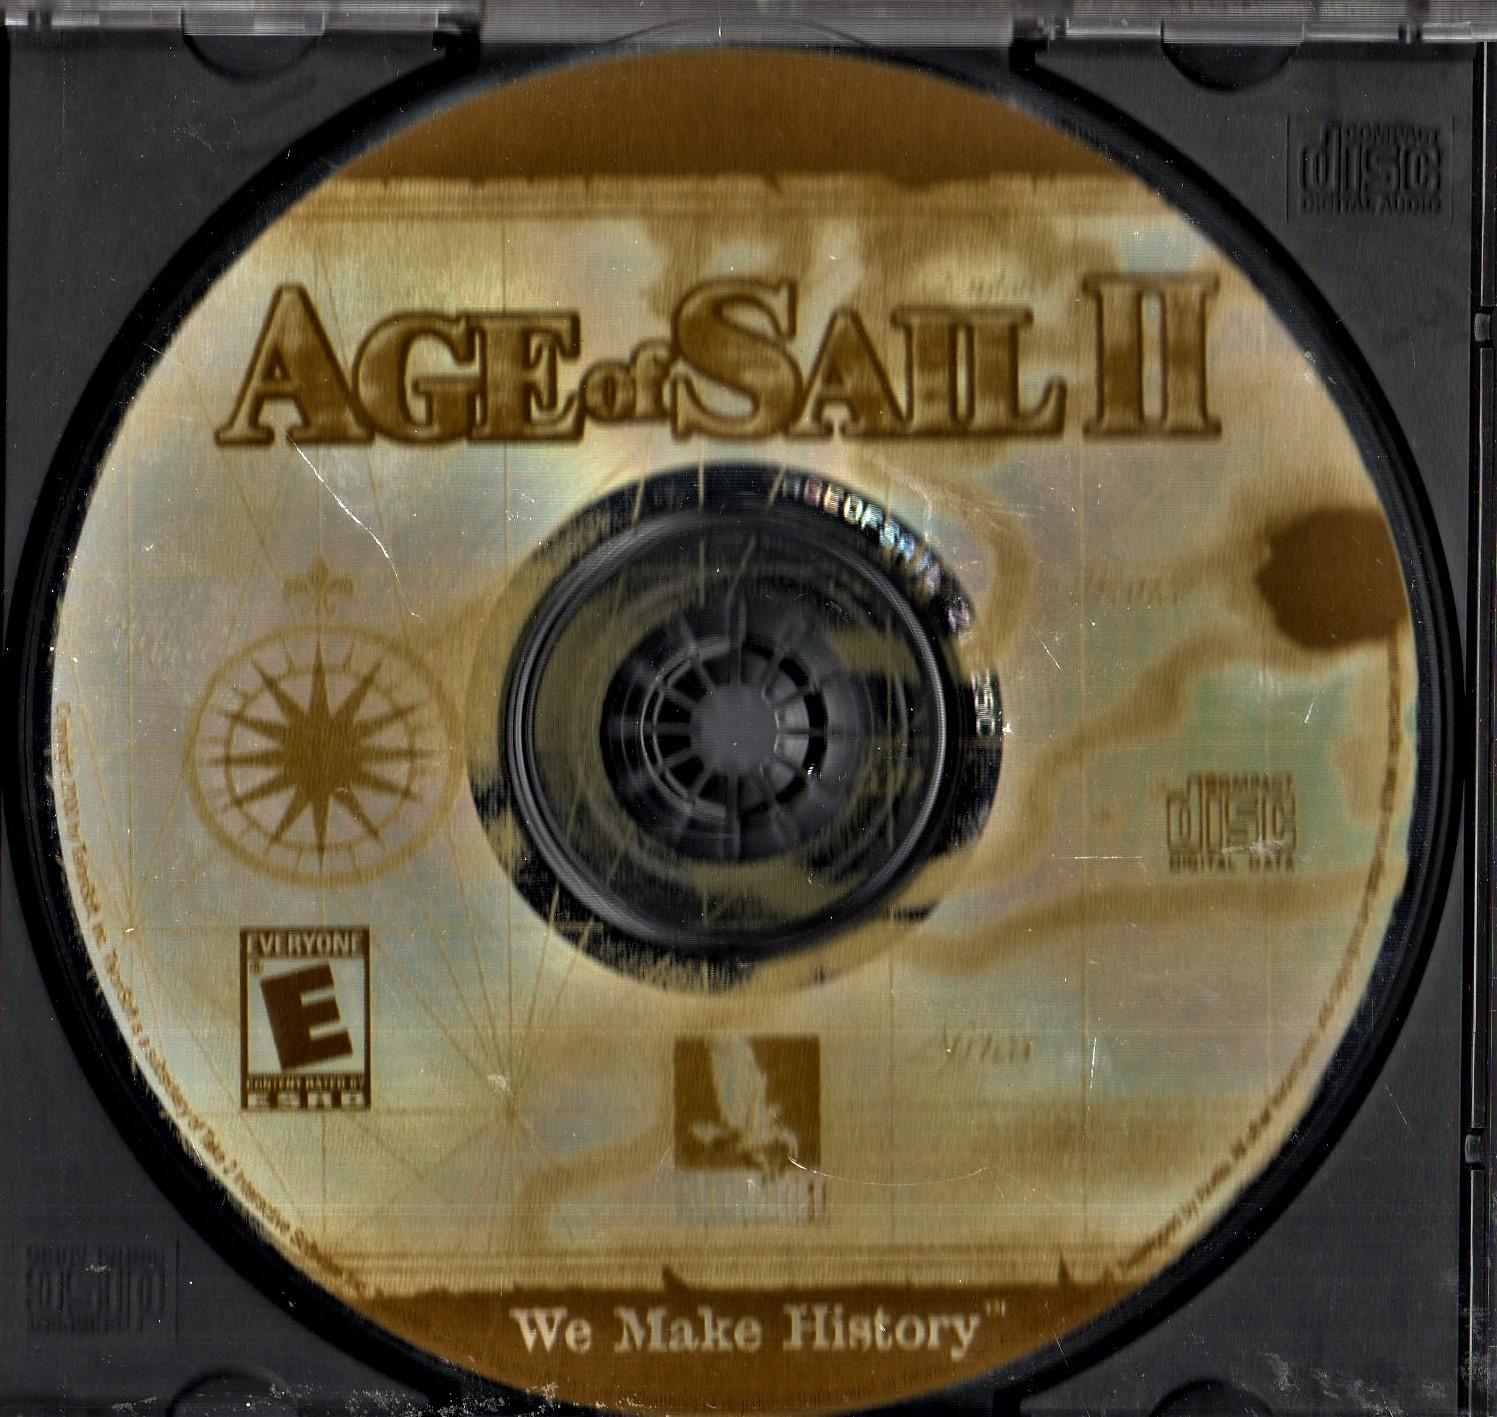 PC Windows Game - Age of Sail II (We Make History)